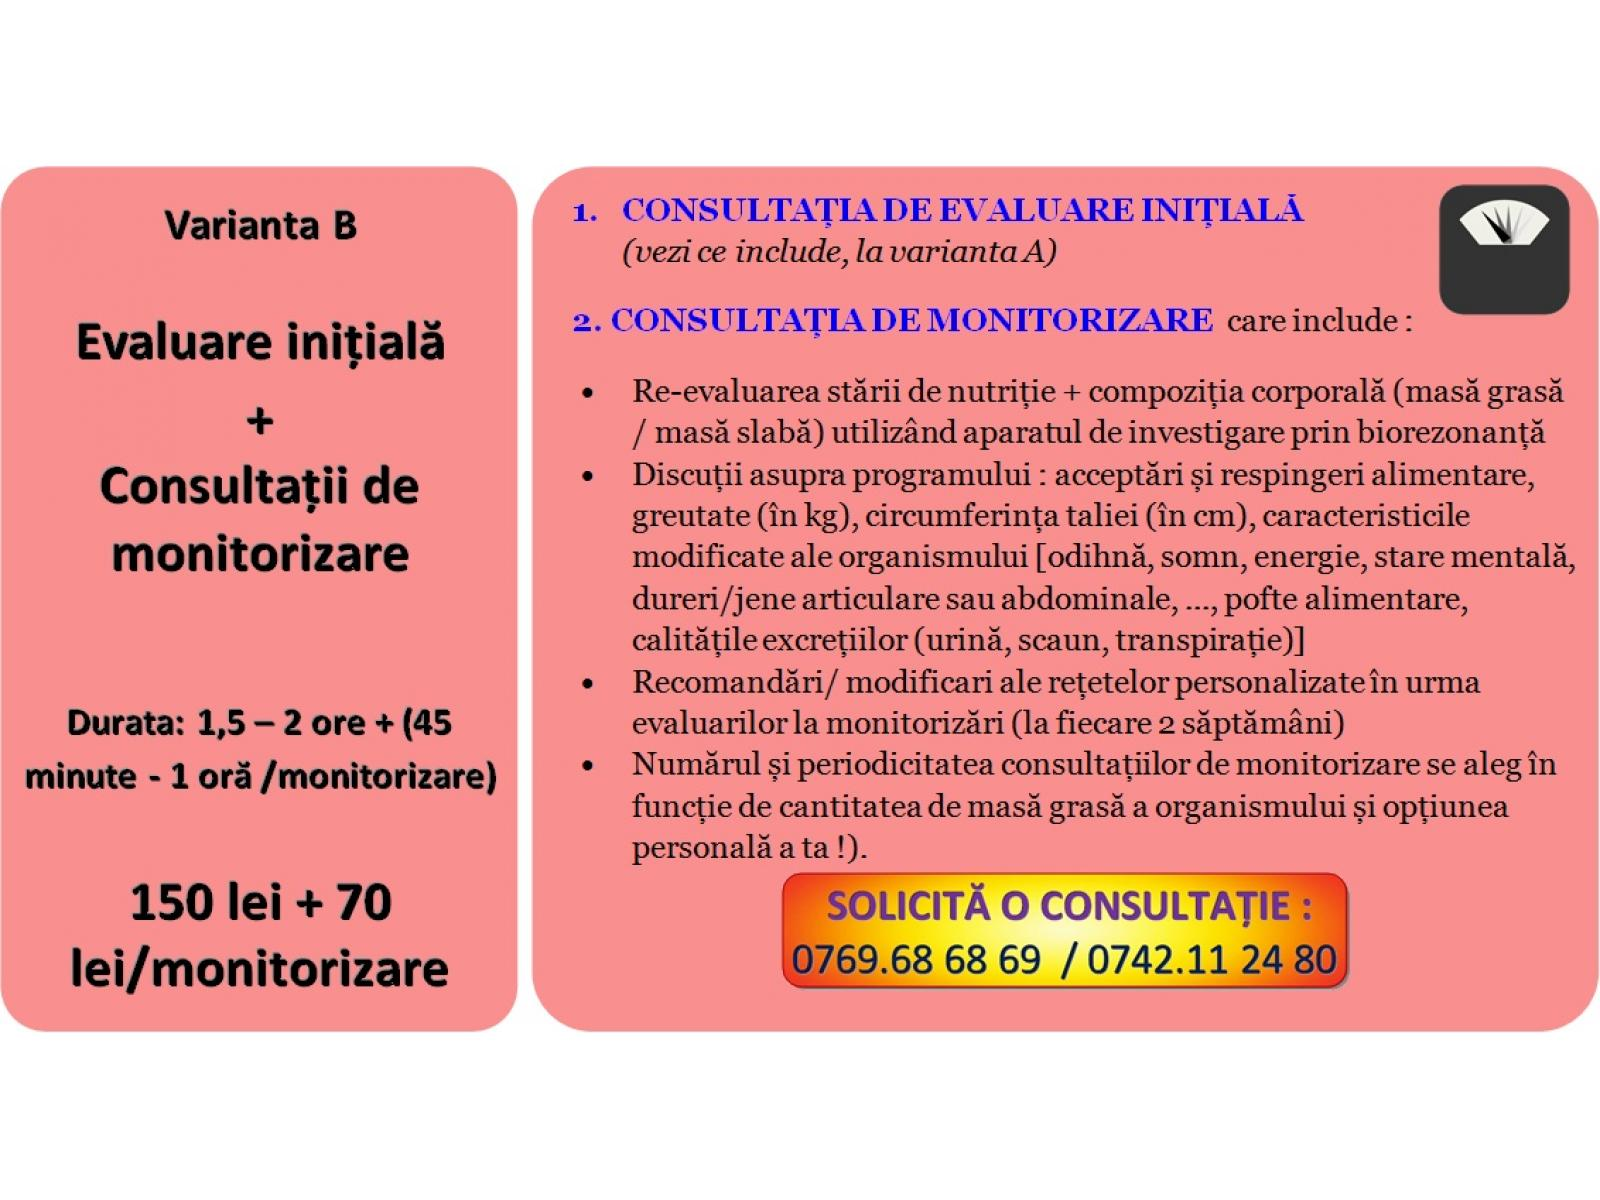 Cabinet de Nutritie si Dietetica - Constantin Tibirna - Program_individual_Varianta_B.jpg